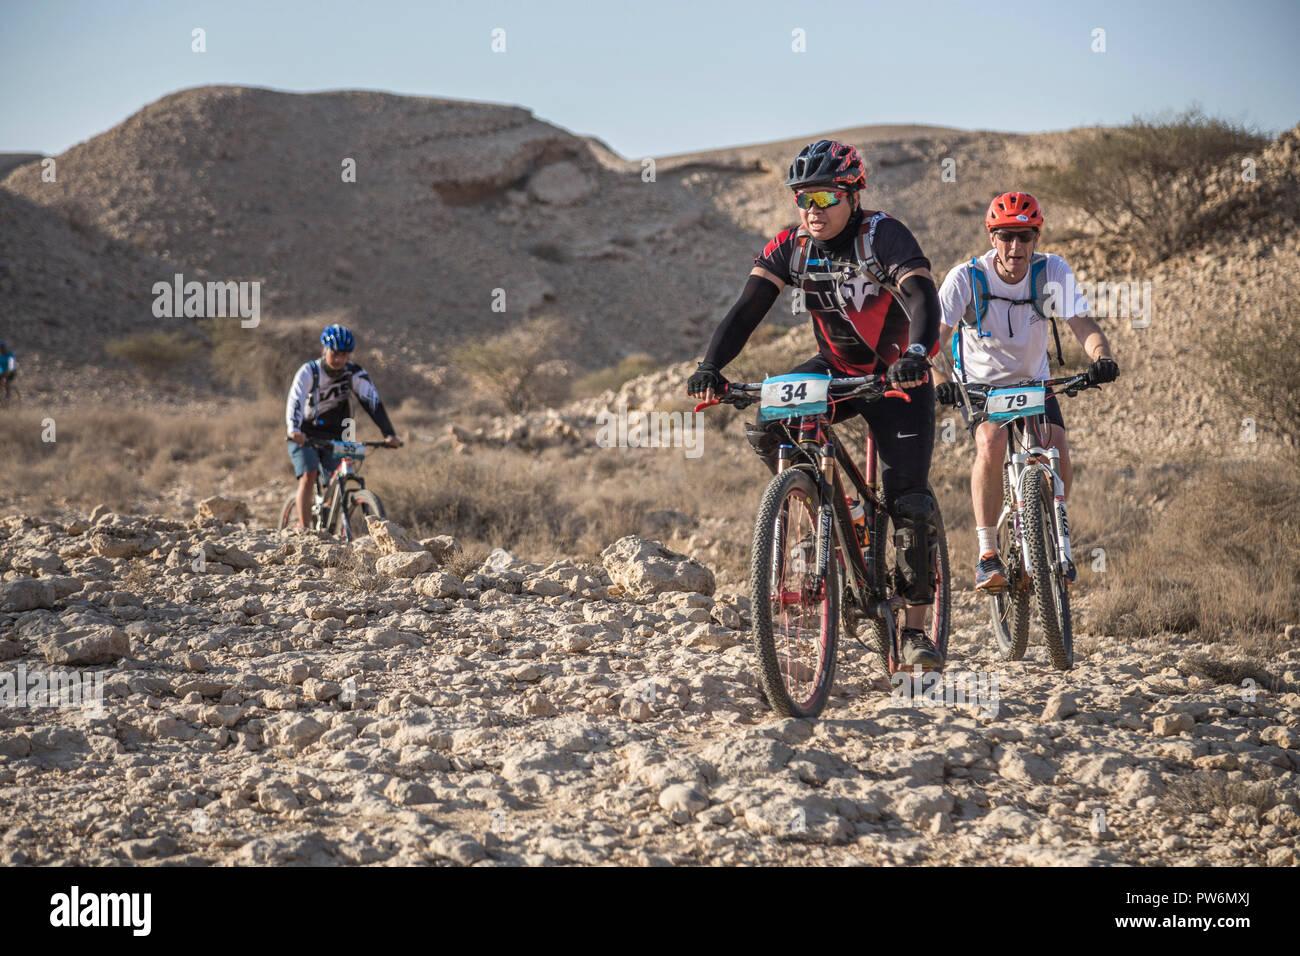 Mountain Bike  Race, Cross country, Muscat, Oman - Stock Image